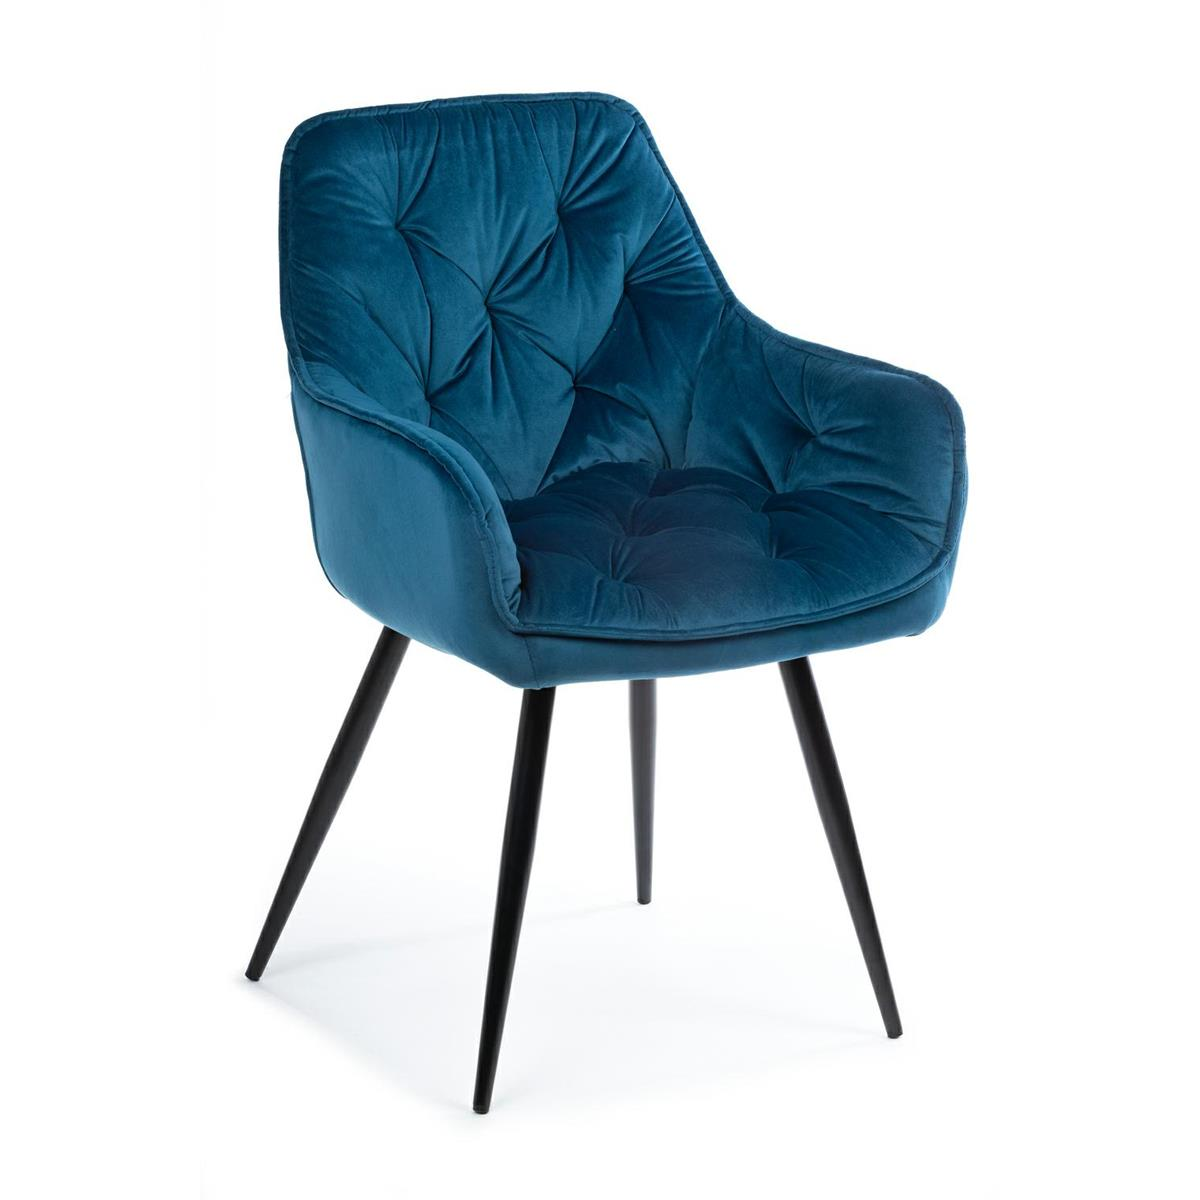 Krzesło pikowane Hana Black Blue